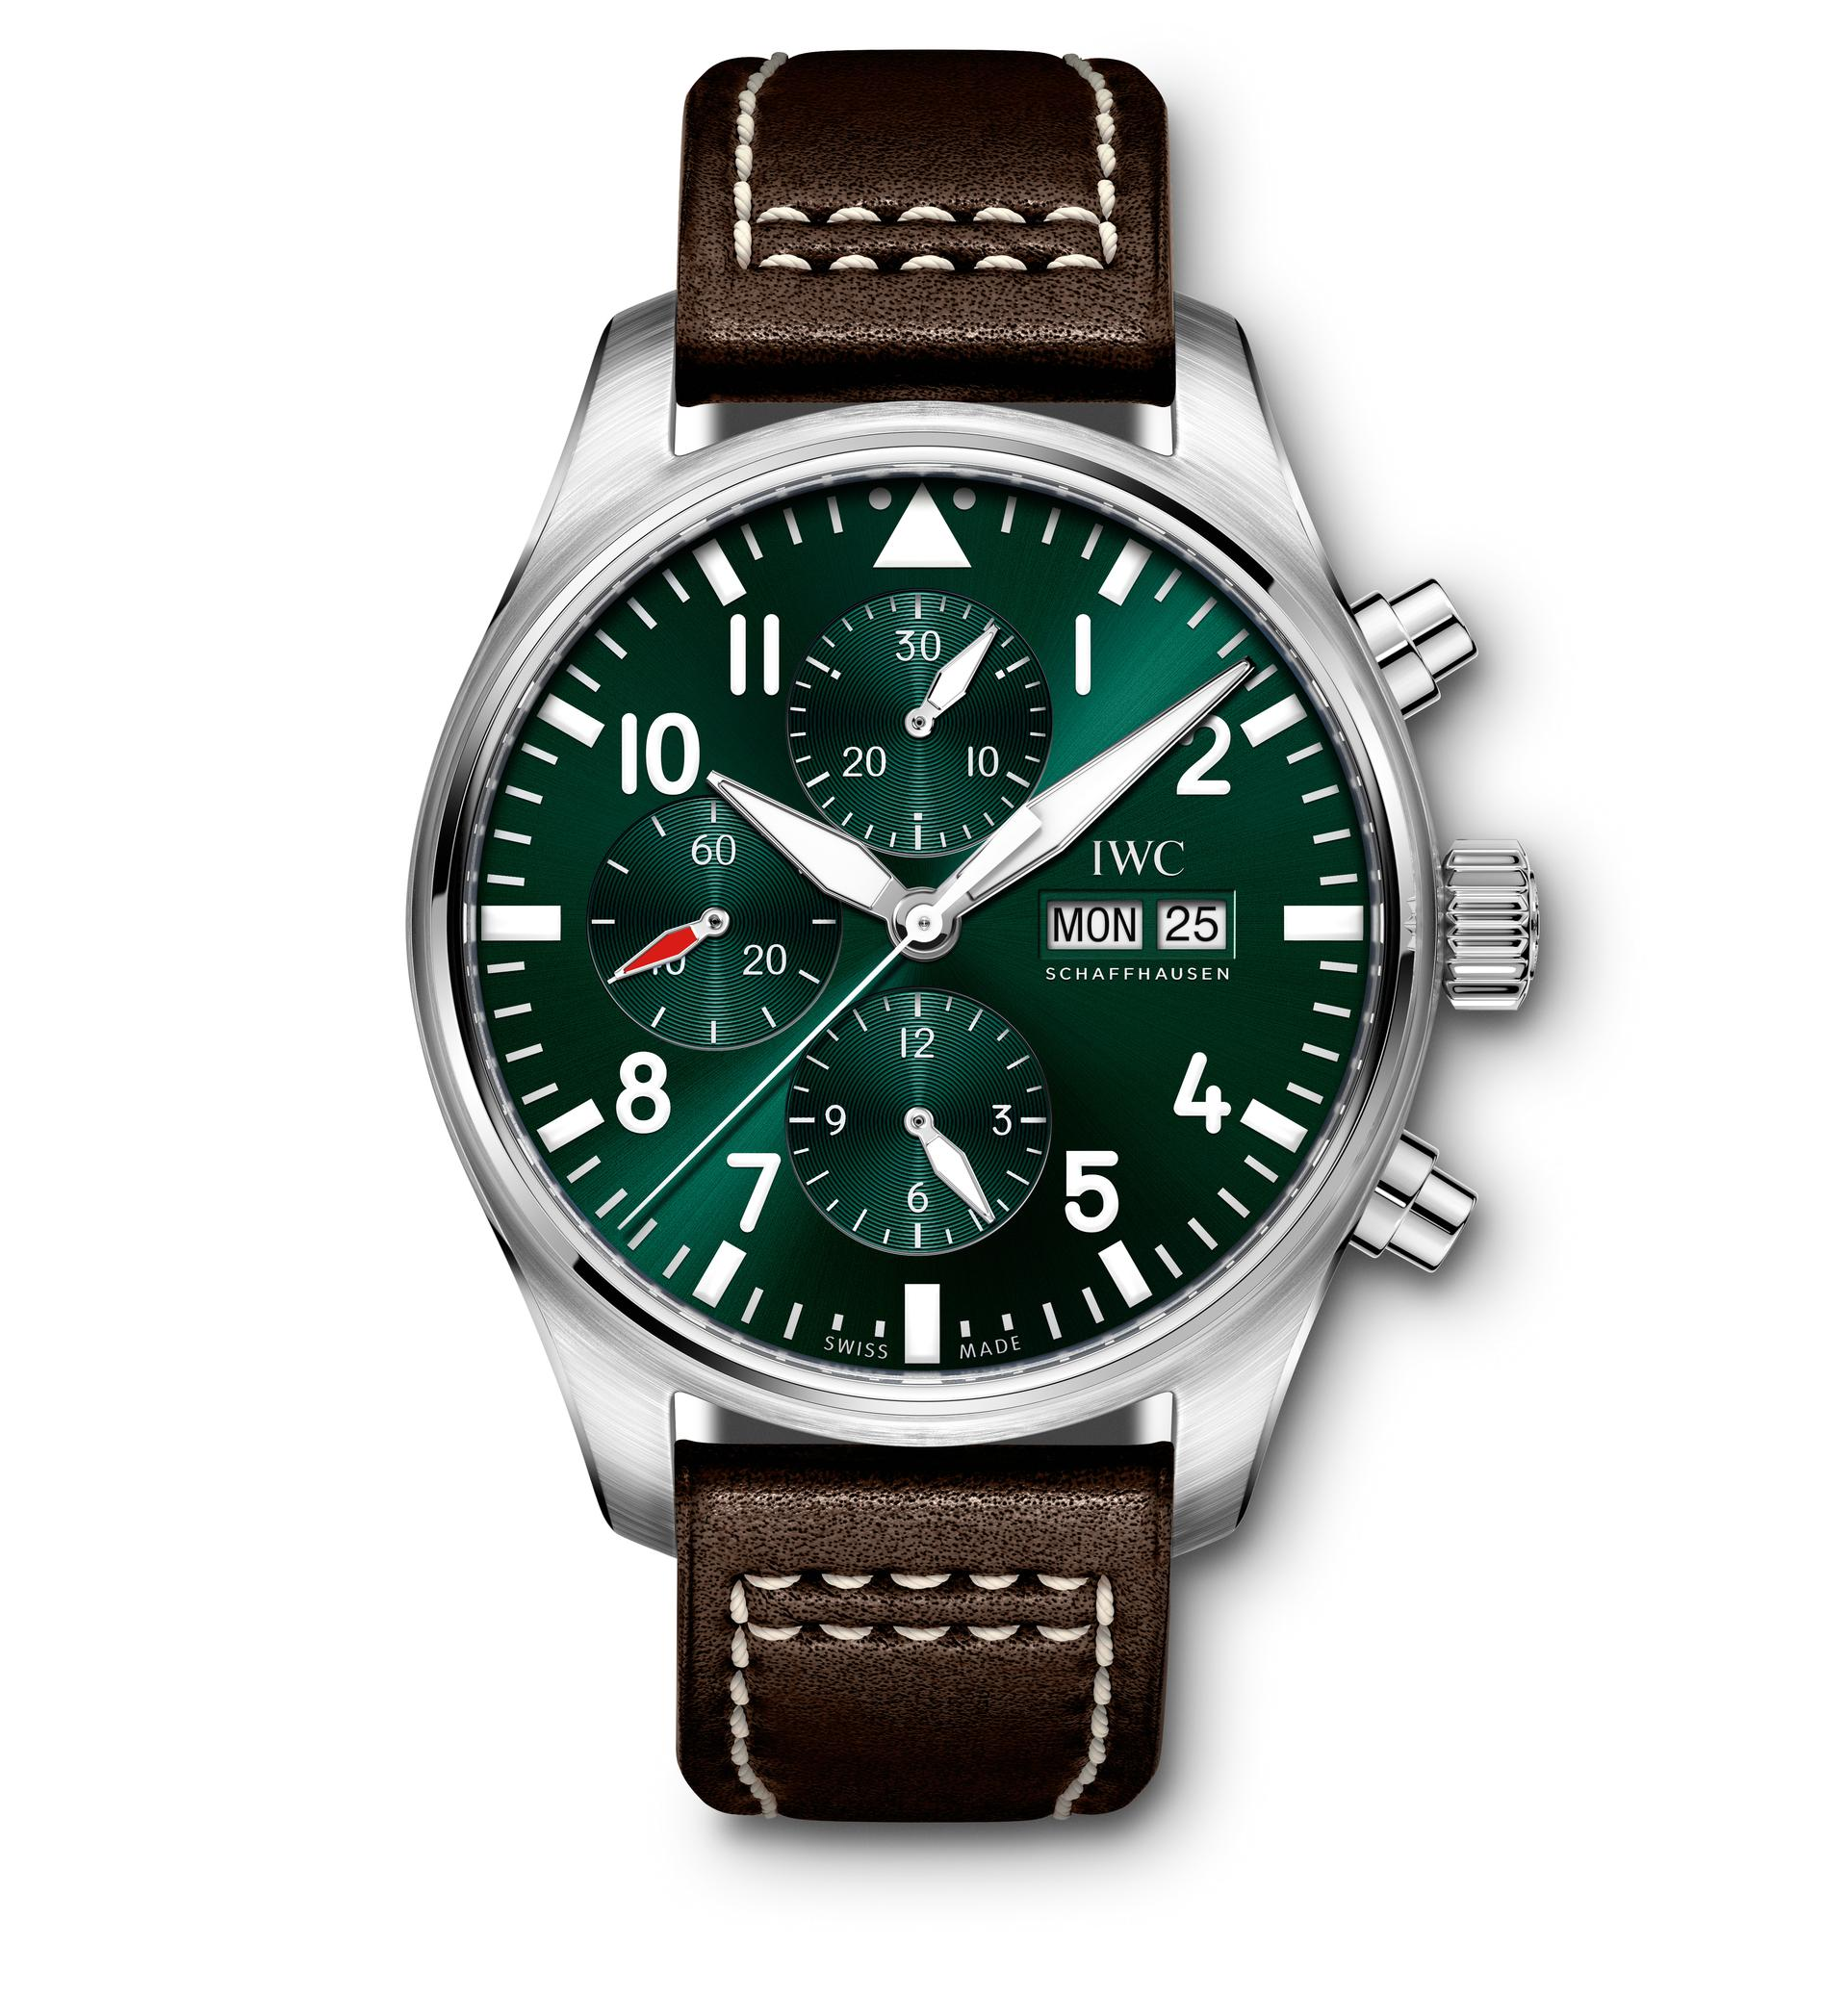 IWC Pilot Watch Chronograph Edition Racing Green REF. IW377726